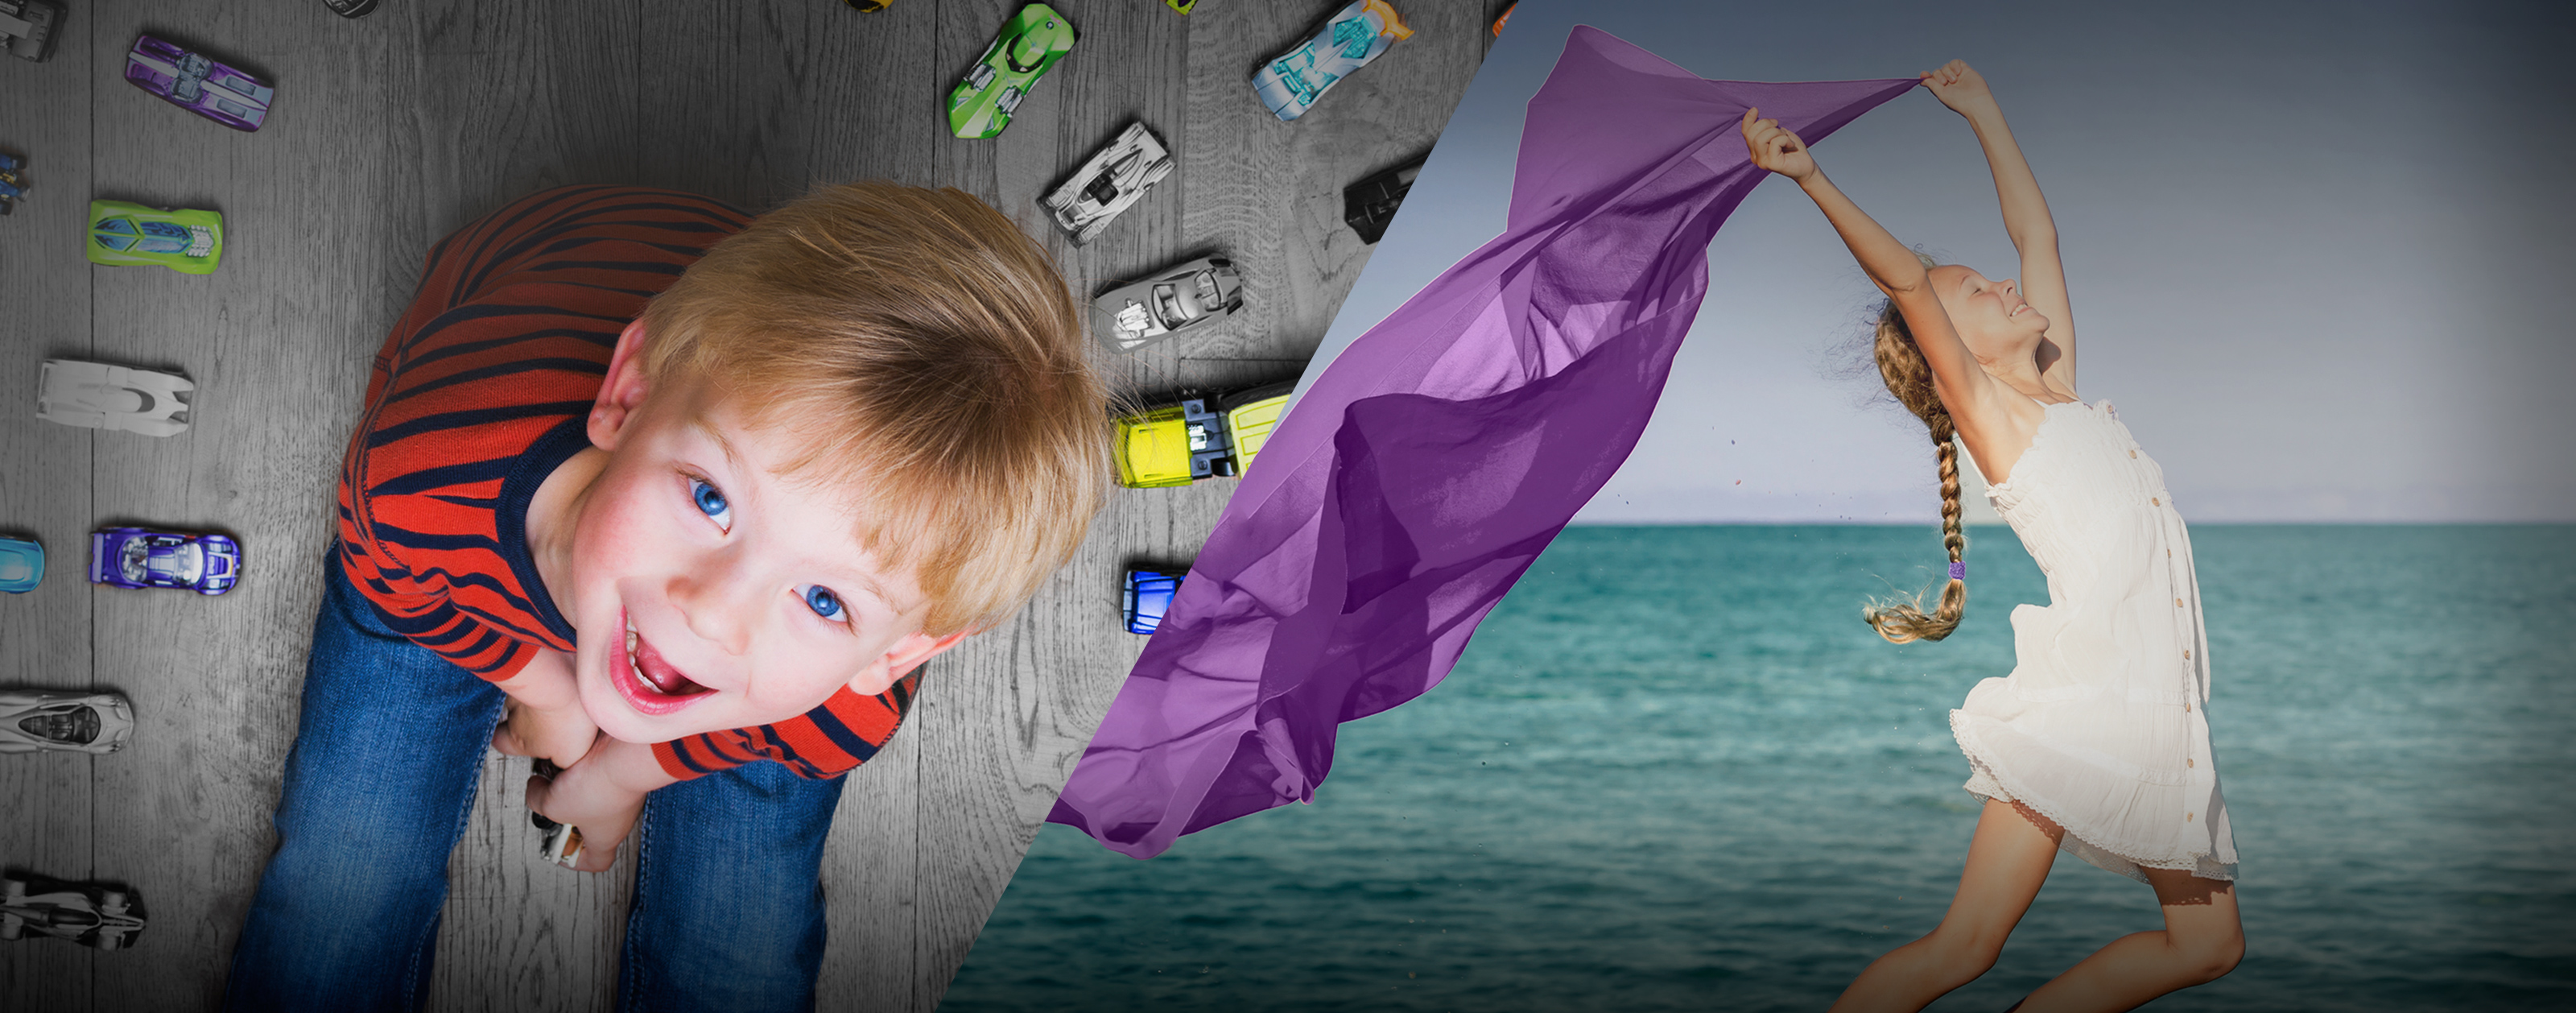 Adobe Photoshop/Premiere Elements